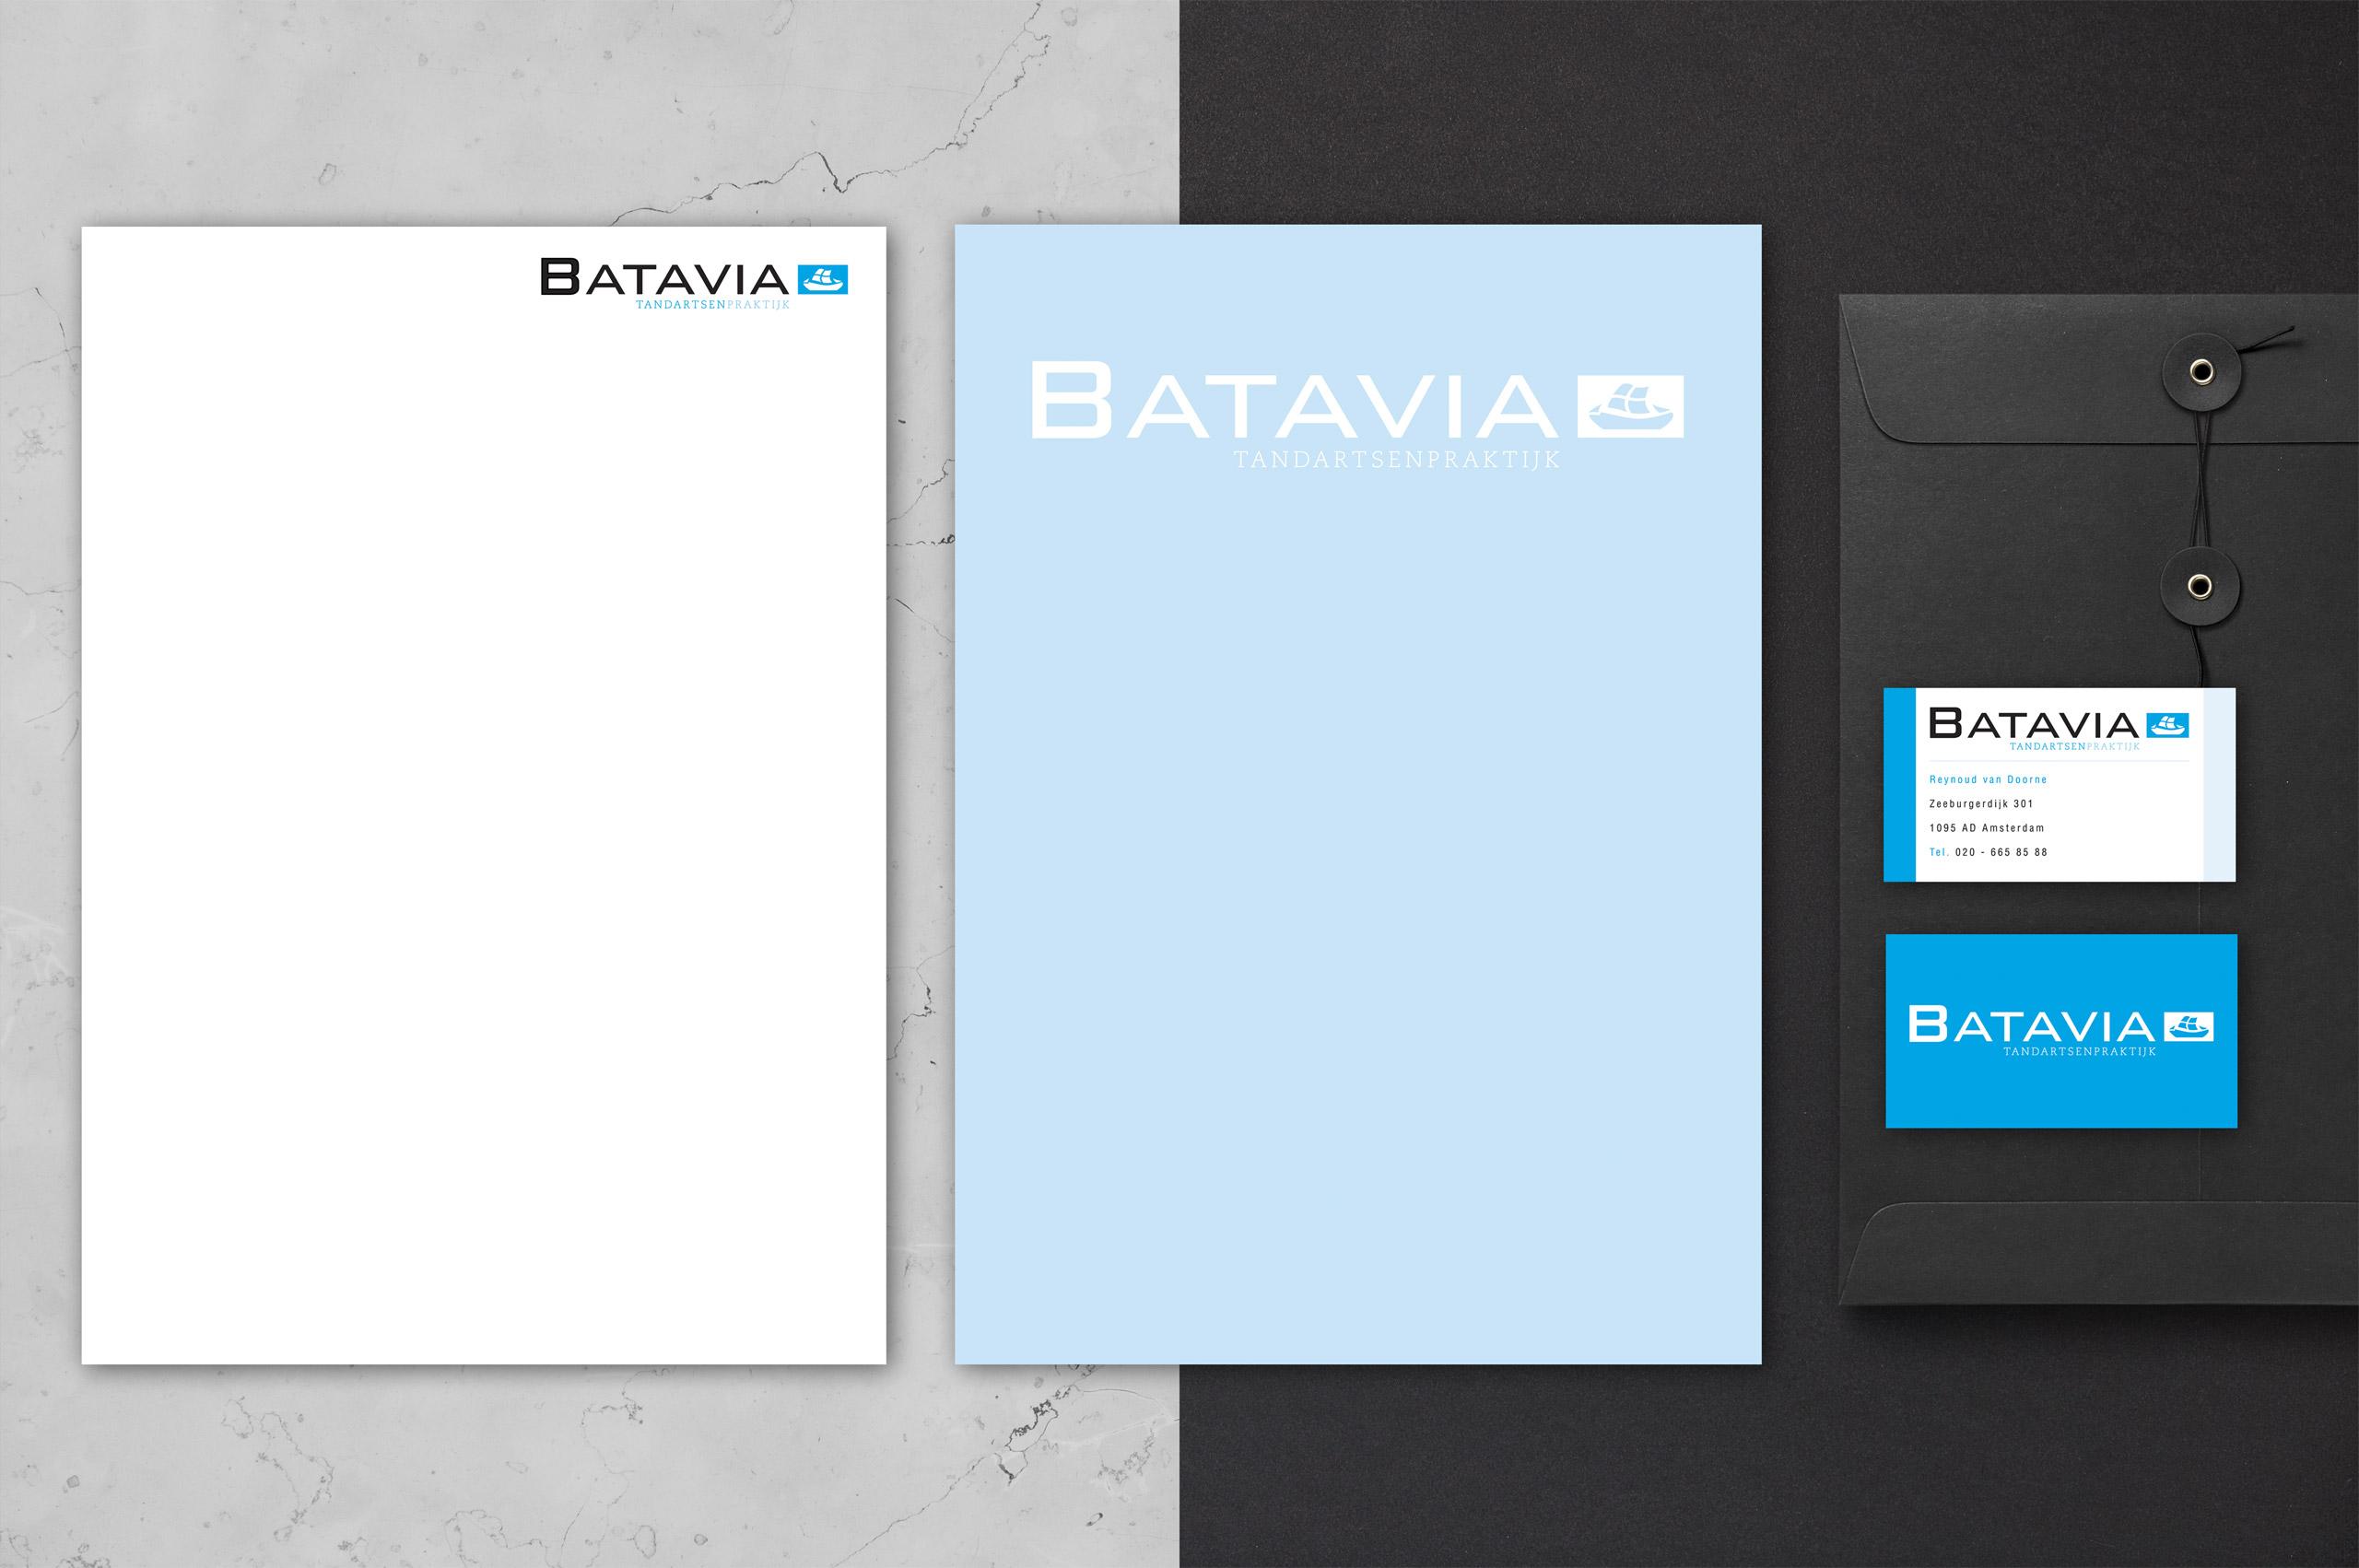 Batavia-Huisstijl